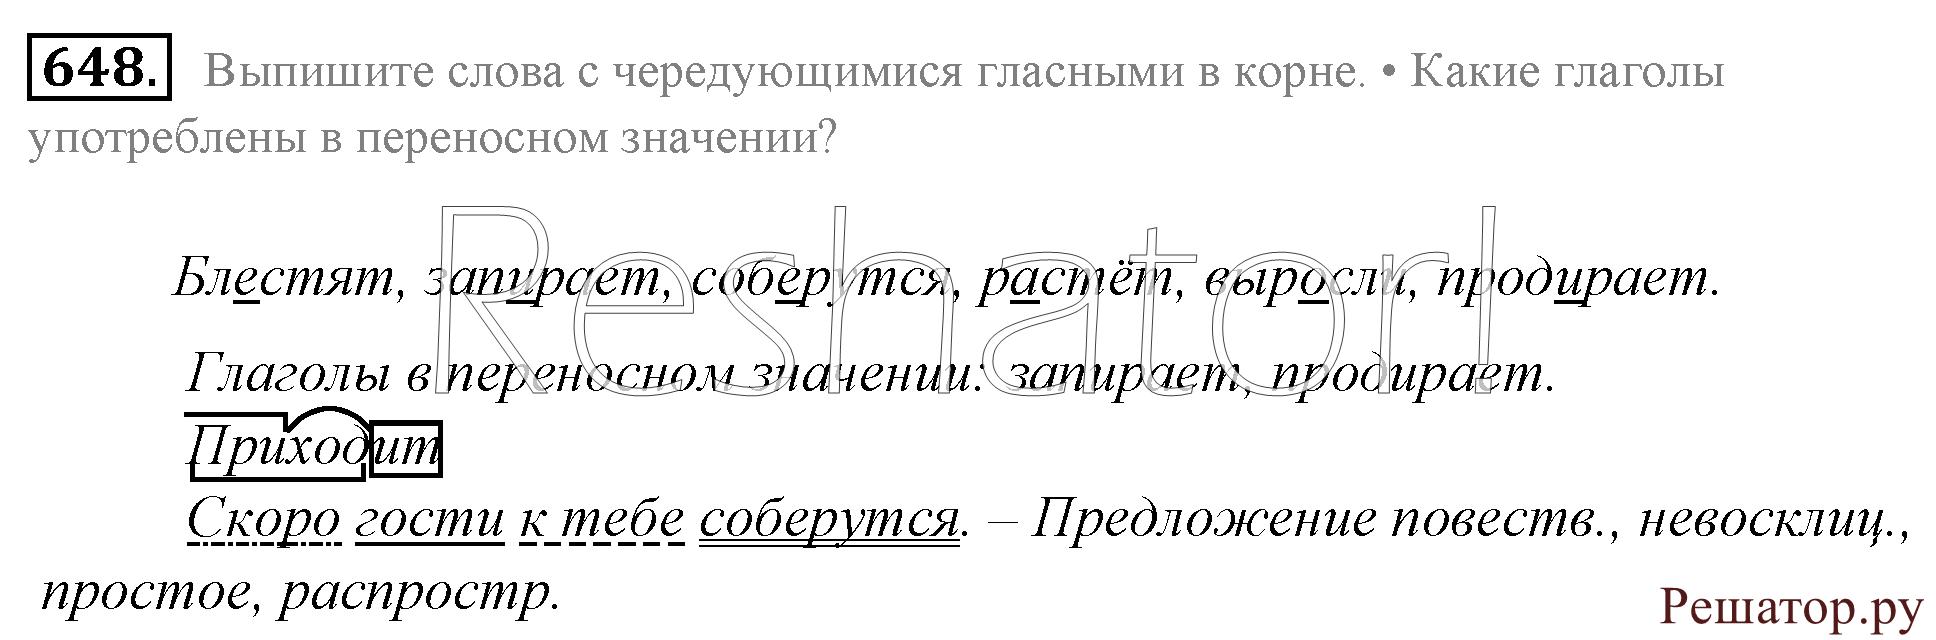 Гдз по русскому языку 5 класс давыдова